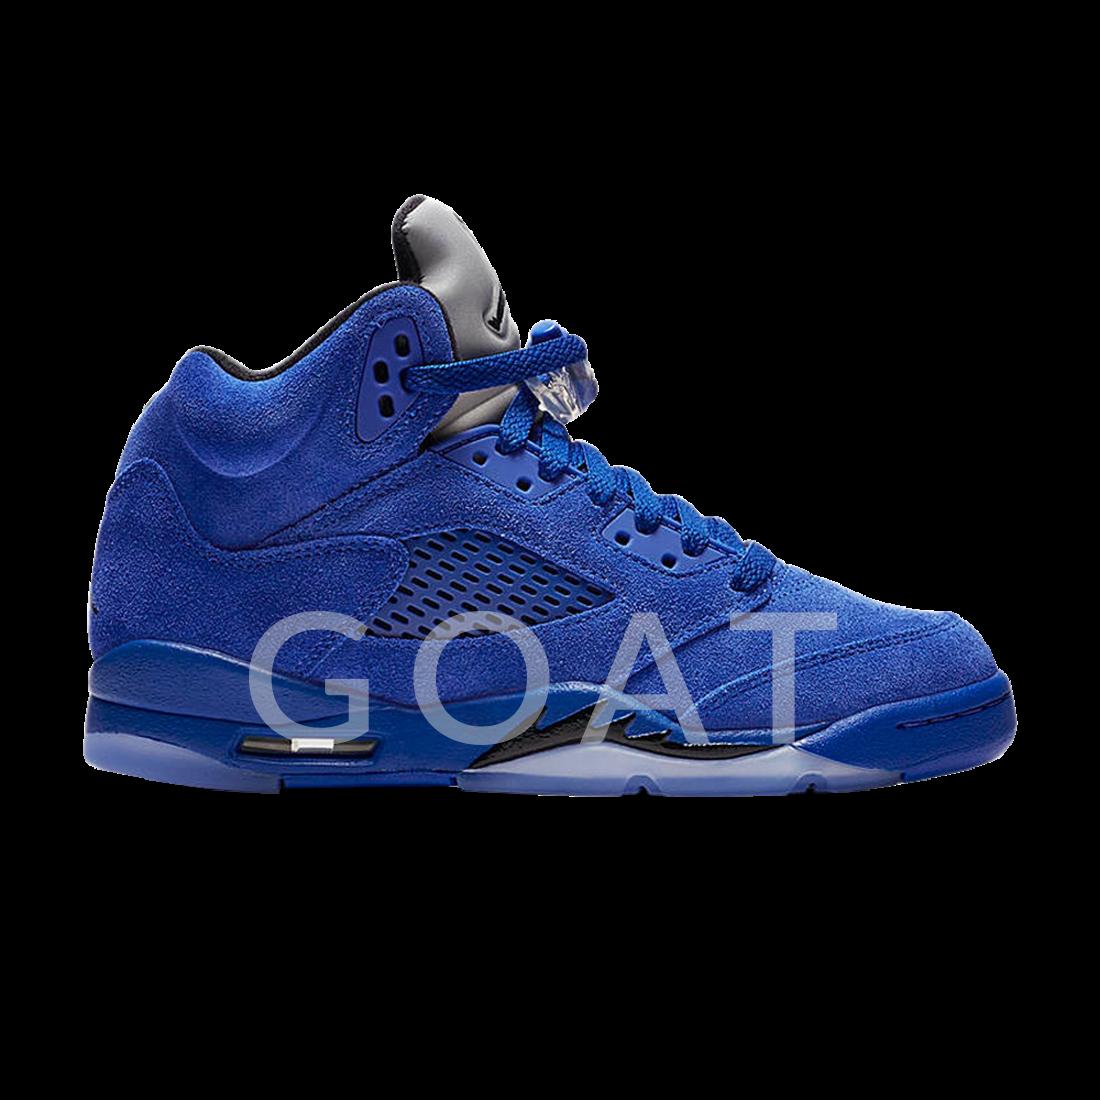 new concept f6ccf a0c05 Air Jordan 5 Retro GS  Blue Suede  - Air Jordan - 440888 401 - game  royal black-game royal   GOAT